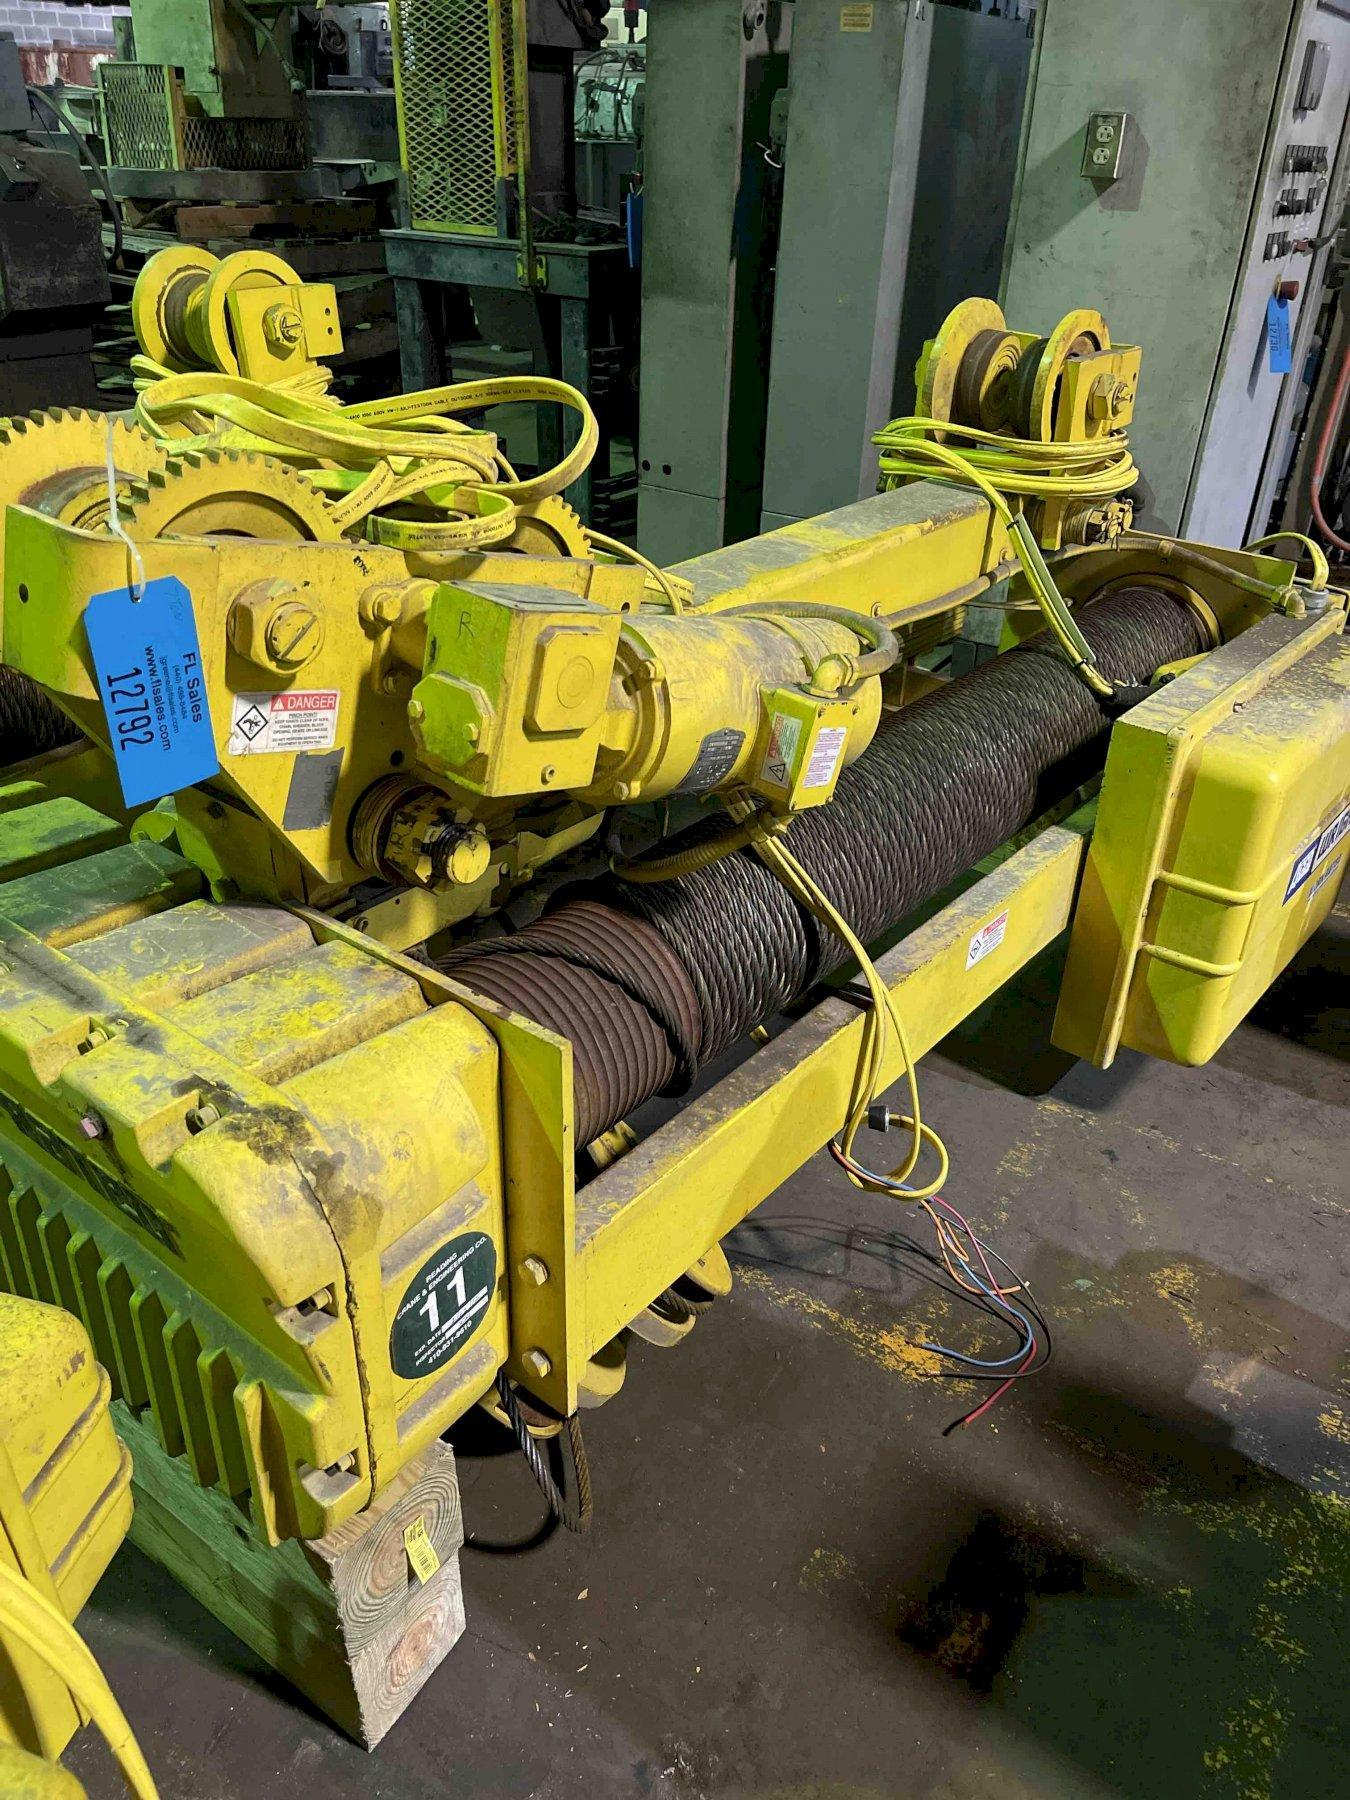 Wright 7 ton electric hoist Model C3W07 s/n 533-20-10351, wth pendent controls, drum # 5, 15/5 fpm, 59' lift, 460 volt